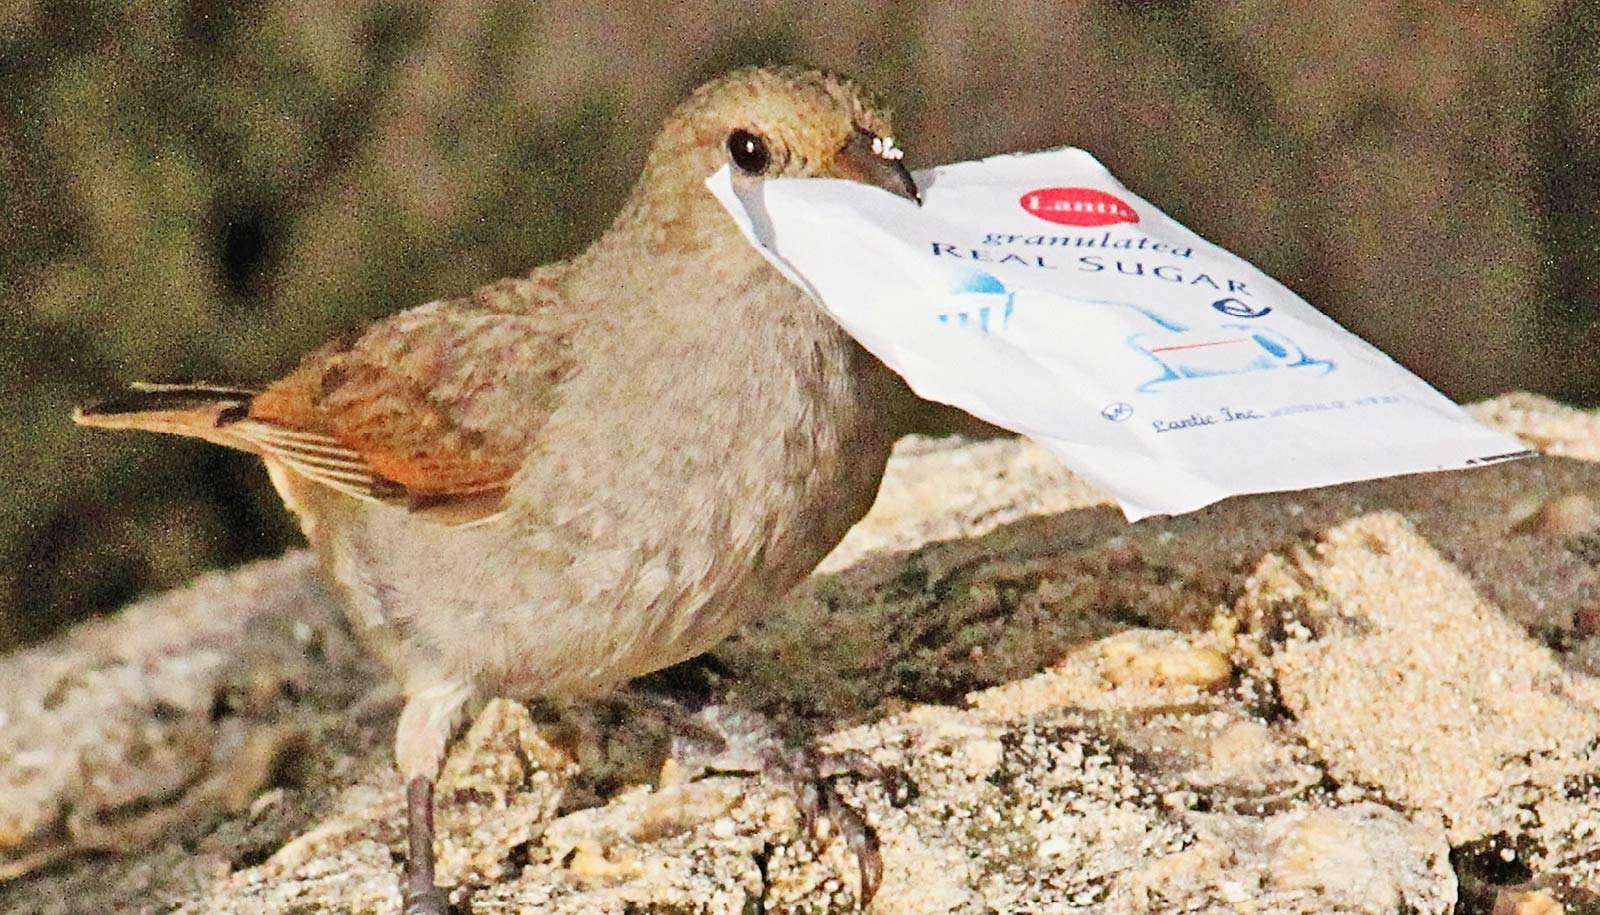 bullfinch opens sugar packet